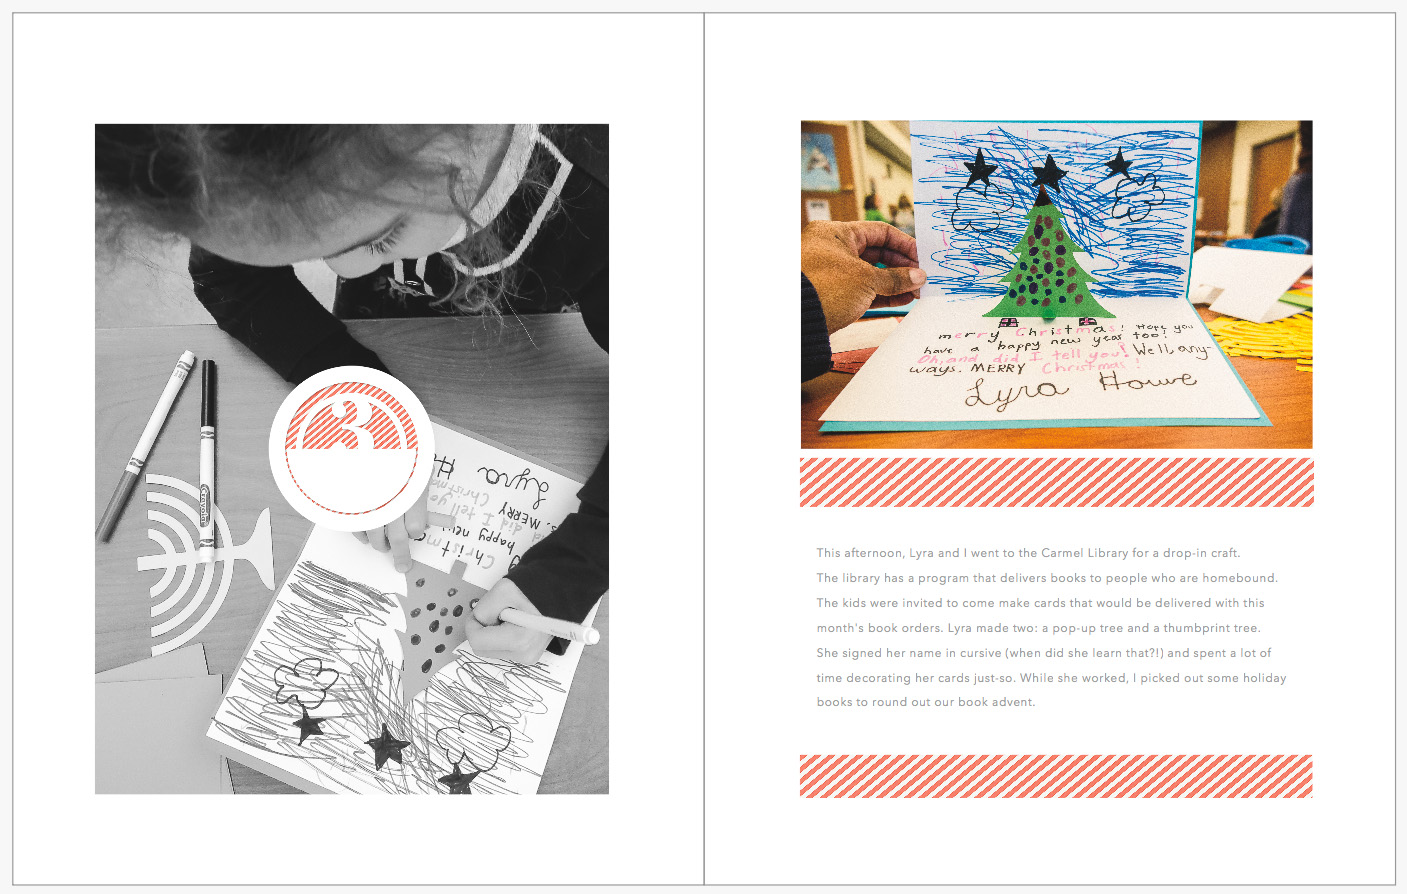 December Daily 2014 photo book | Crafts at Carmel Public Library Carmel, IN | yolandamadethis.com